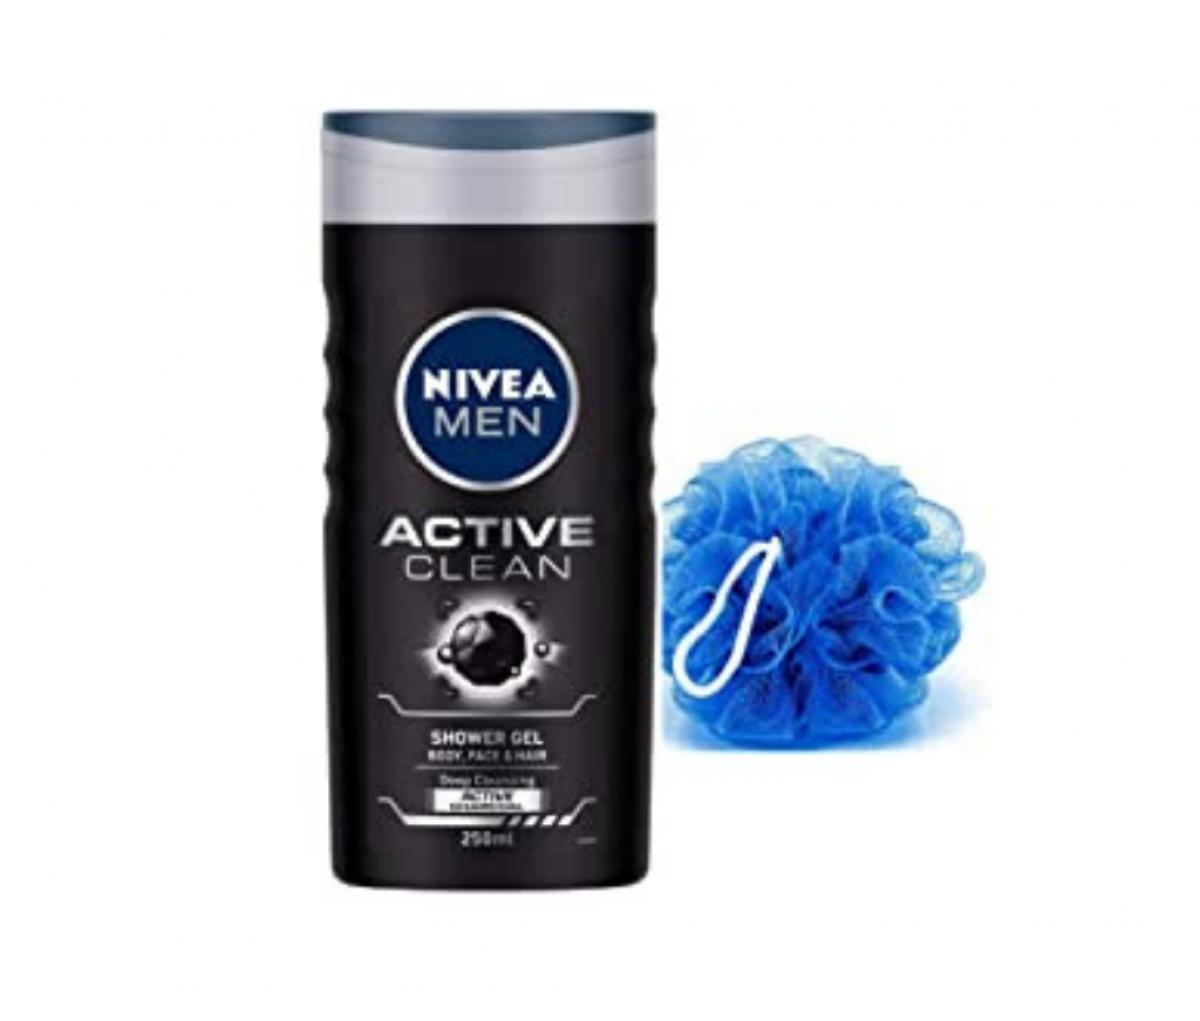 Nivea 250ml Active Clean 3in1 Shower Gel